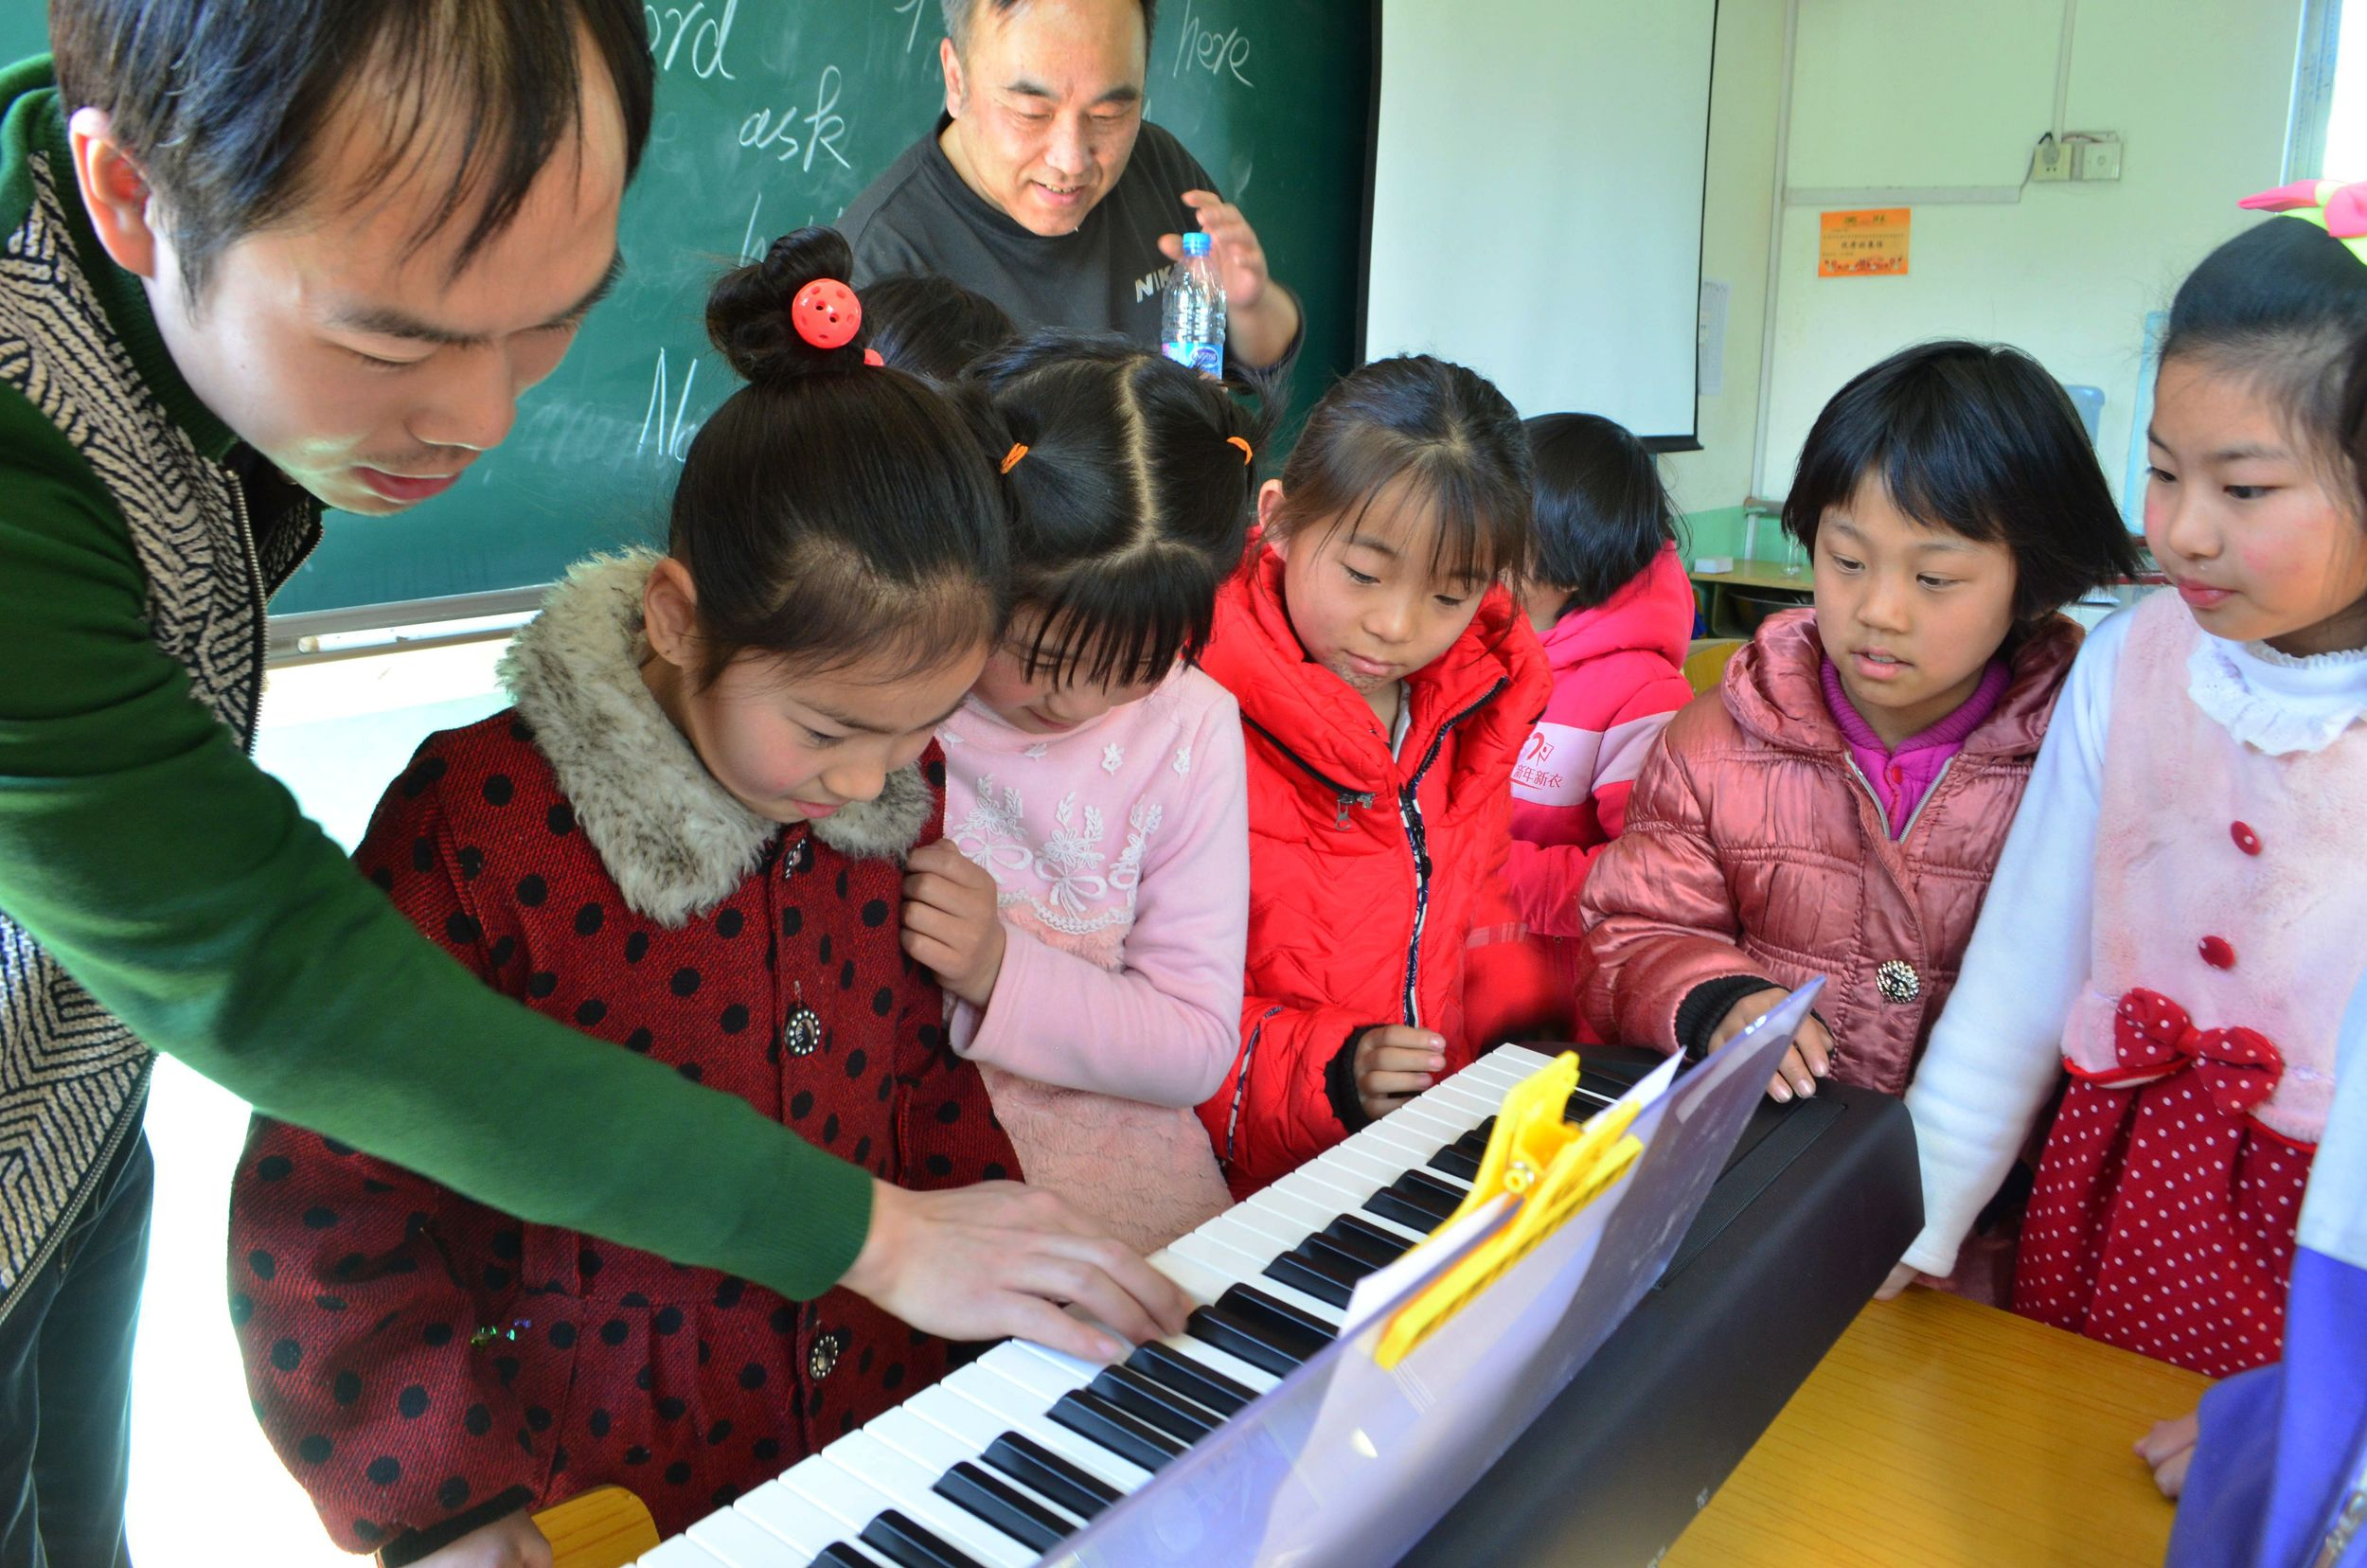 _Teacher and students playing piano老师在教学生弹琴.jpg